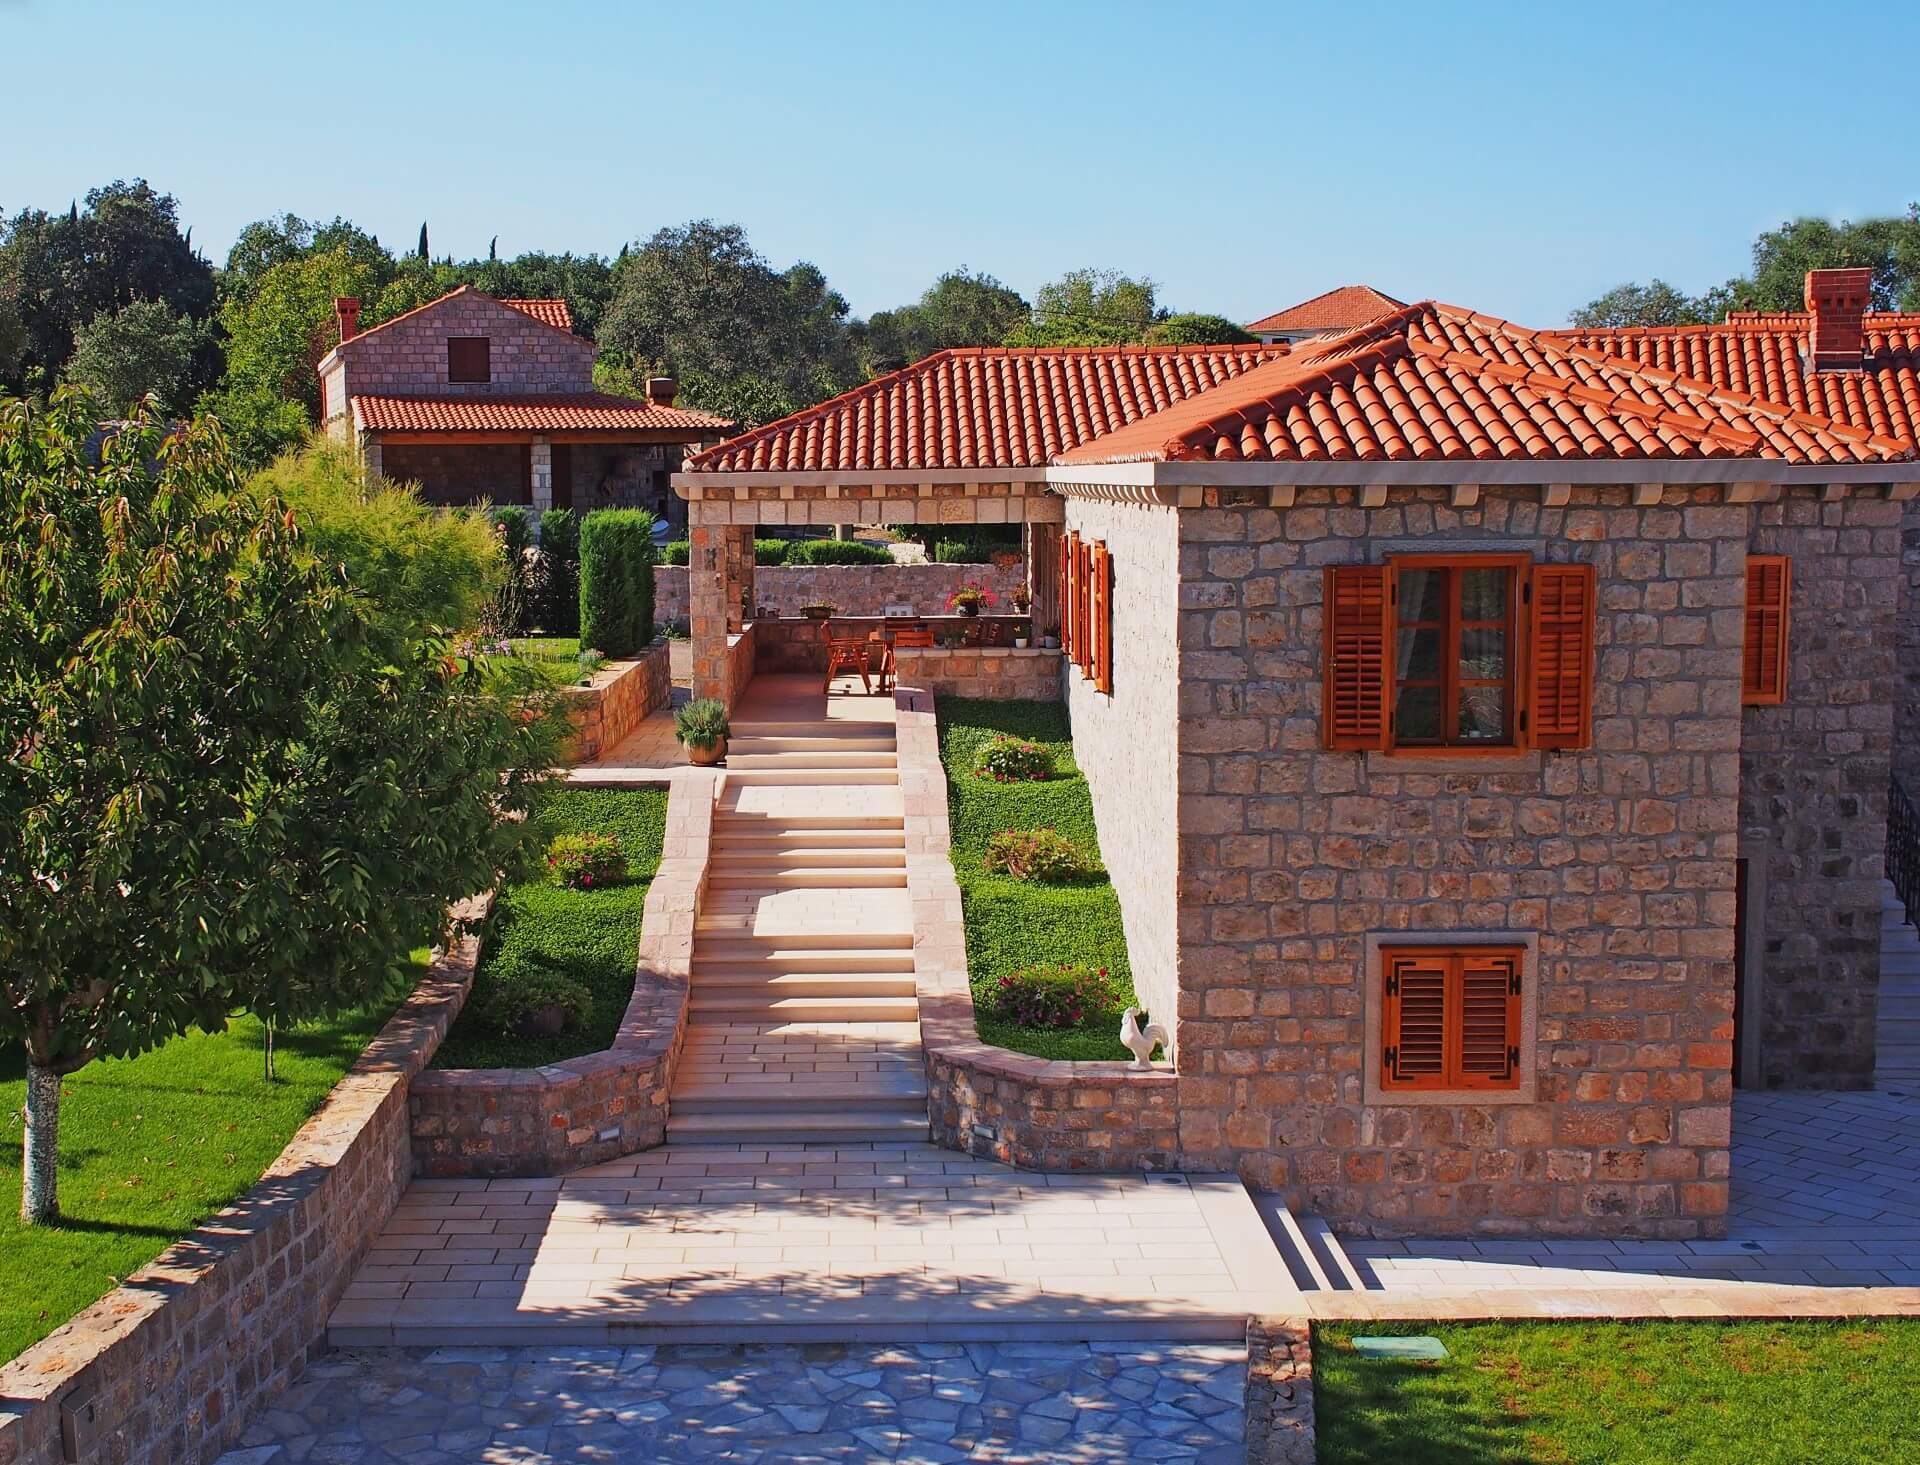 Rustic Stone Villa With Pool For Rent Konavle Dubrovnik